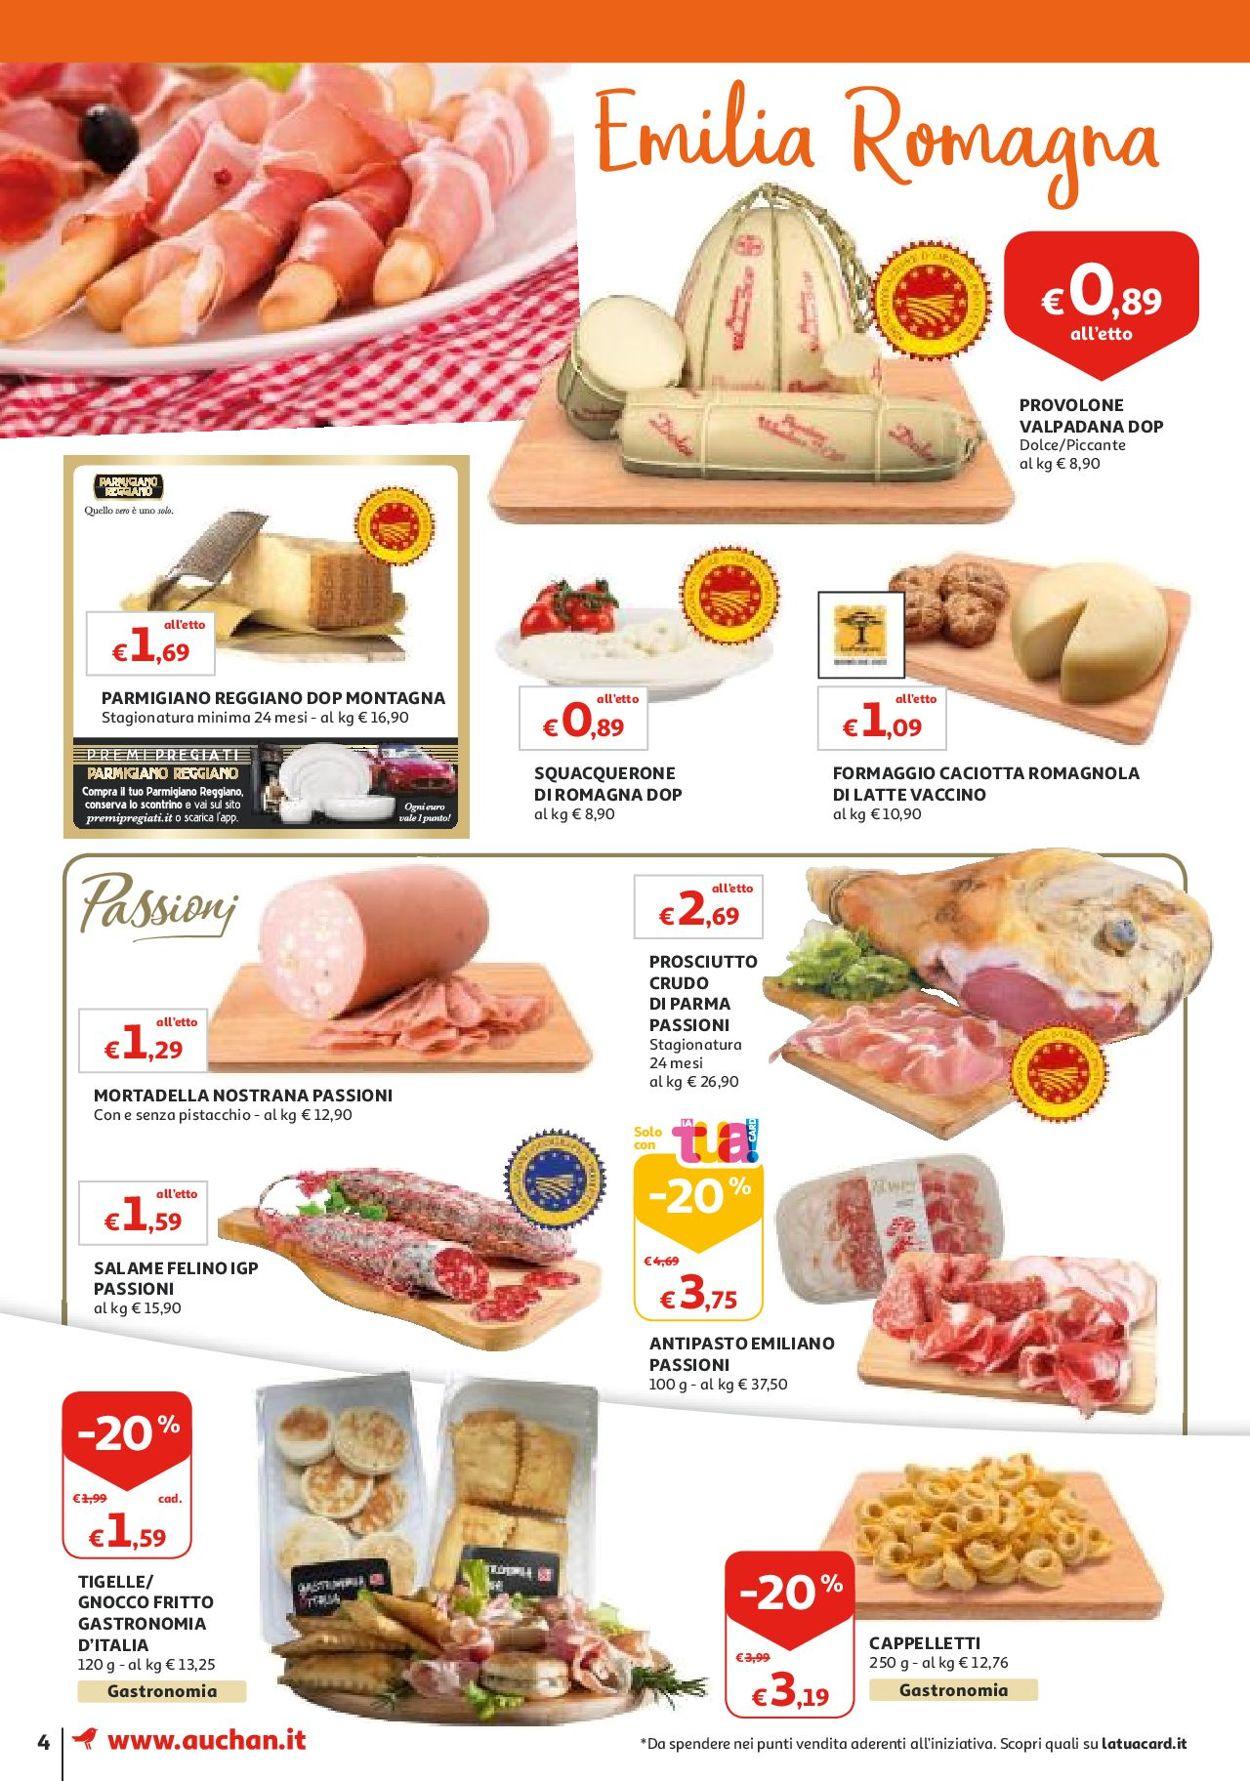 Volantino Auchan - Offerte 23/05-30/05/2019 (Pagina 4)